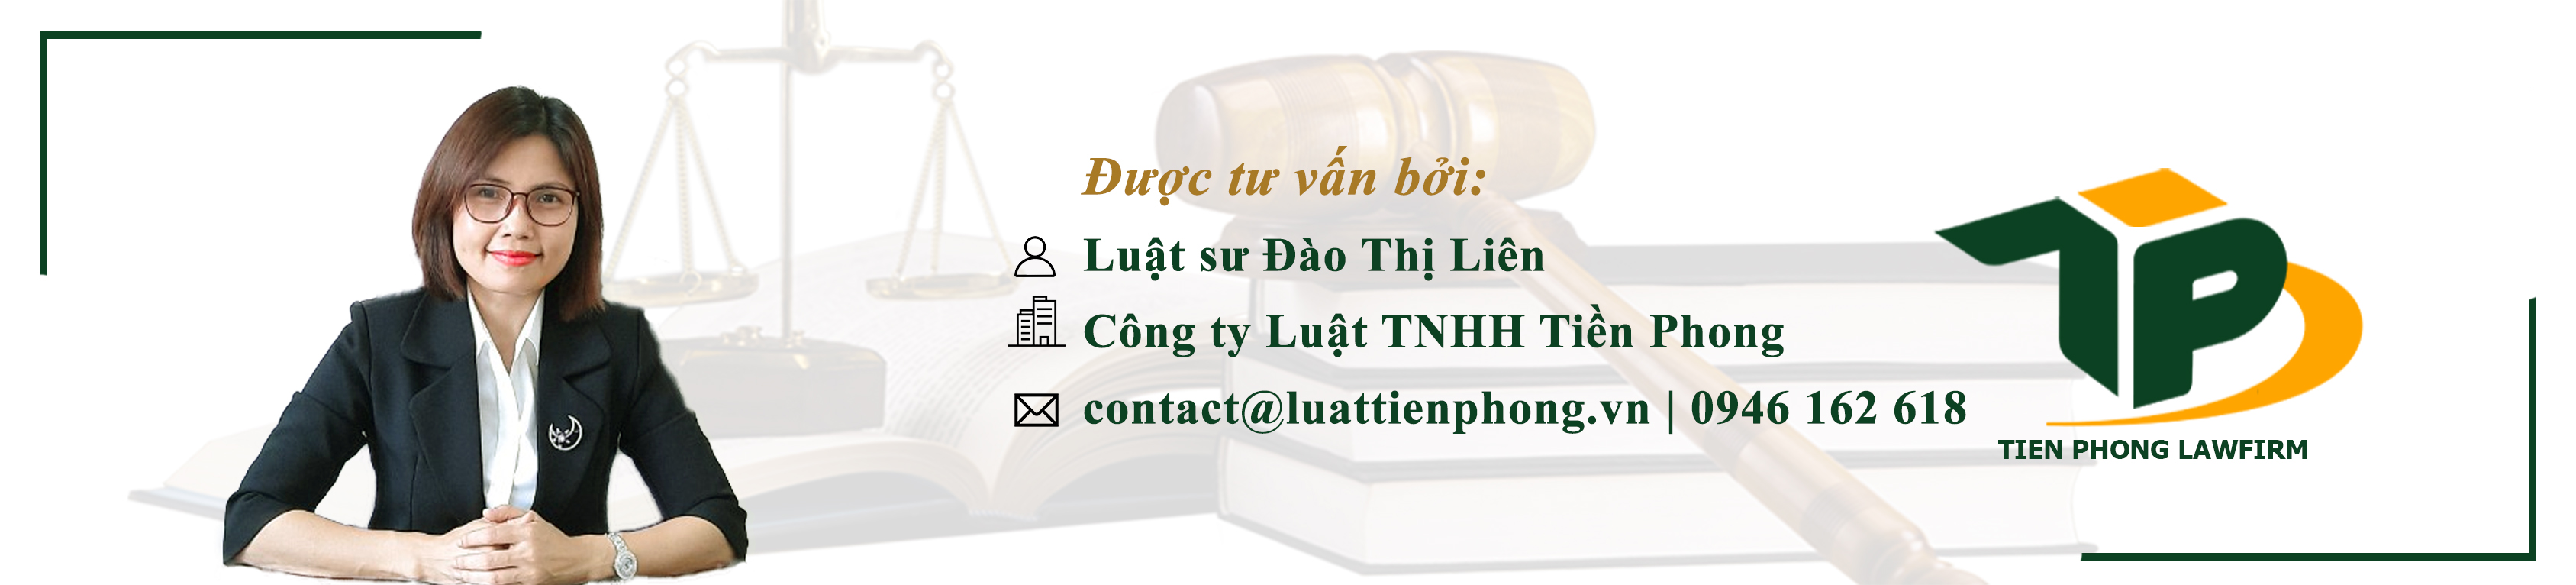 Luật sư Tiền Phong